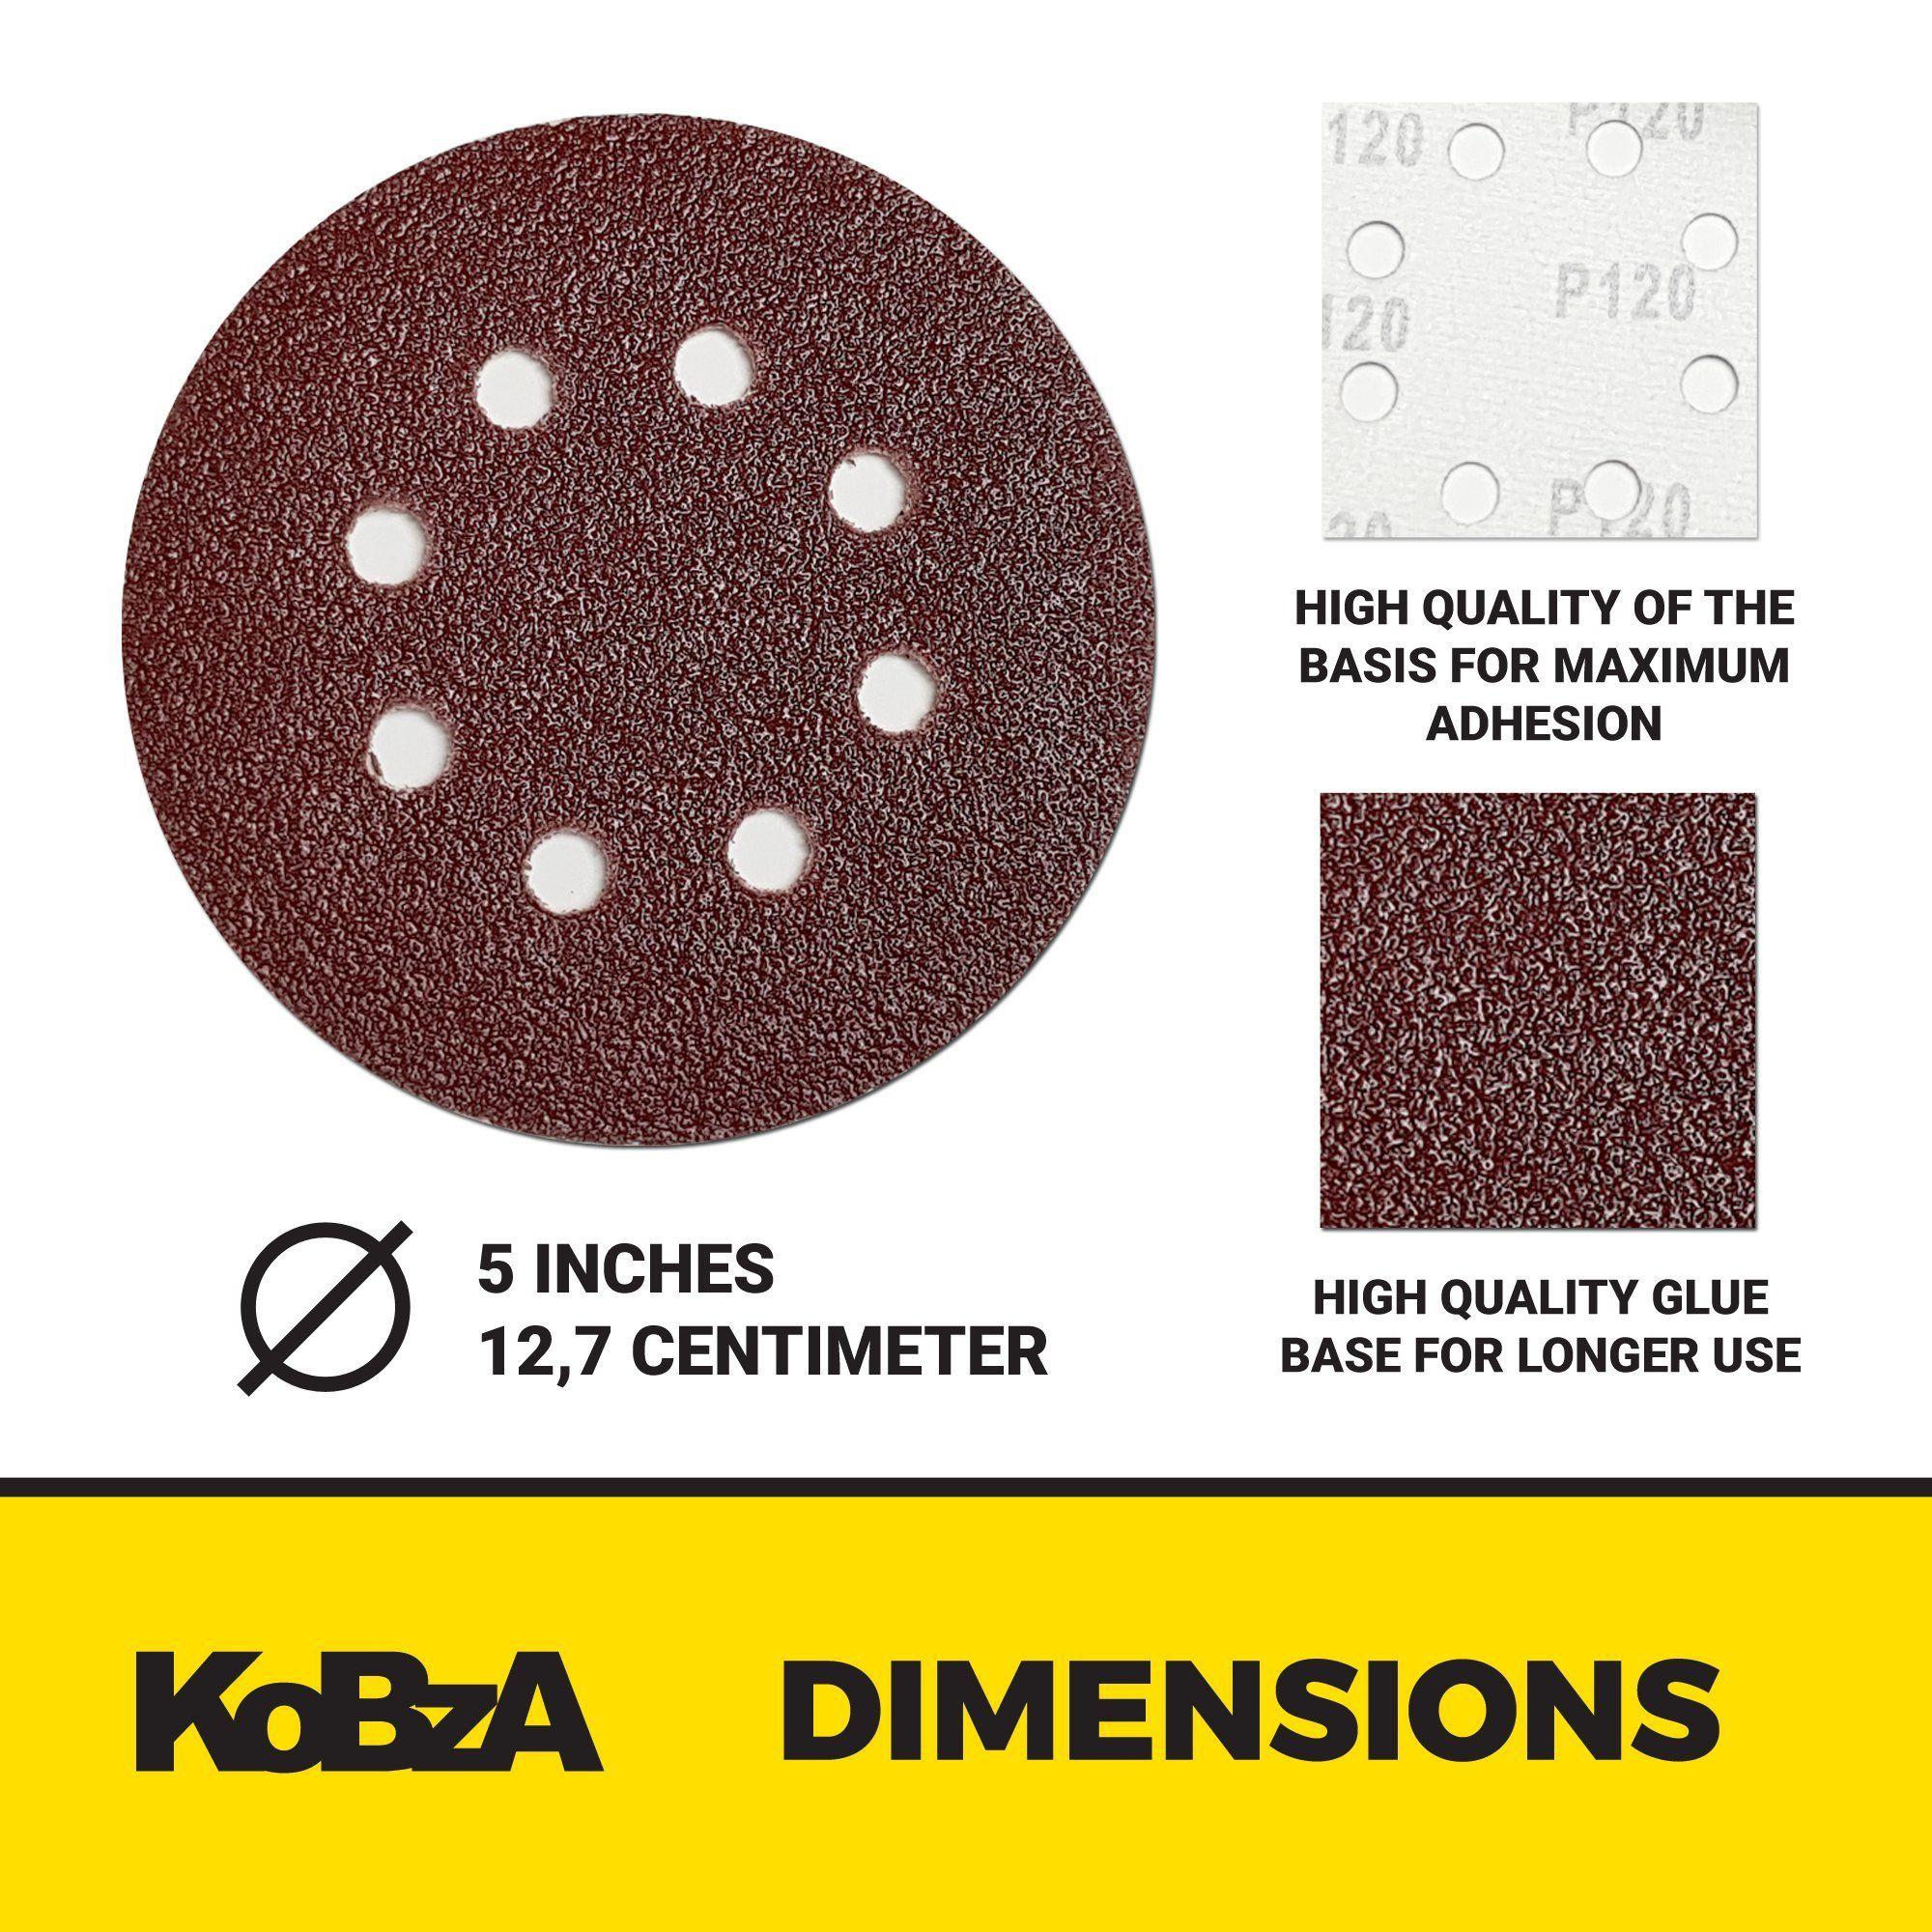 Kobza 60 Pieces 5 Inch 8 Holes Sanding Discs Hook And Loop Sandpaper Backing 10 Of 40 60 80 120 180 240 Grit Optimal Set Sanding Woodworking Tools Sandpaper